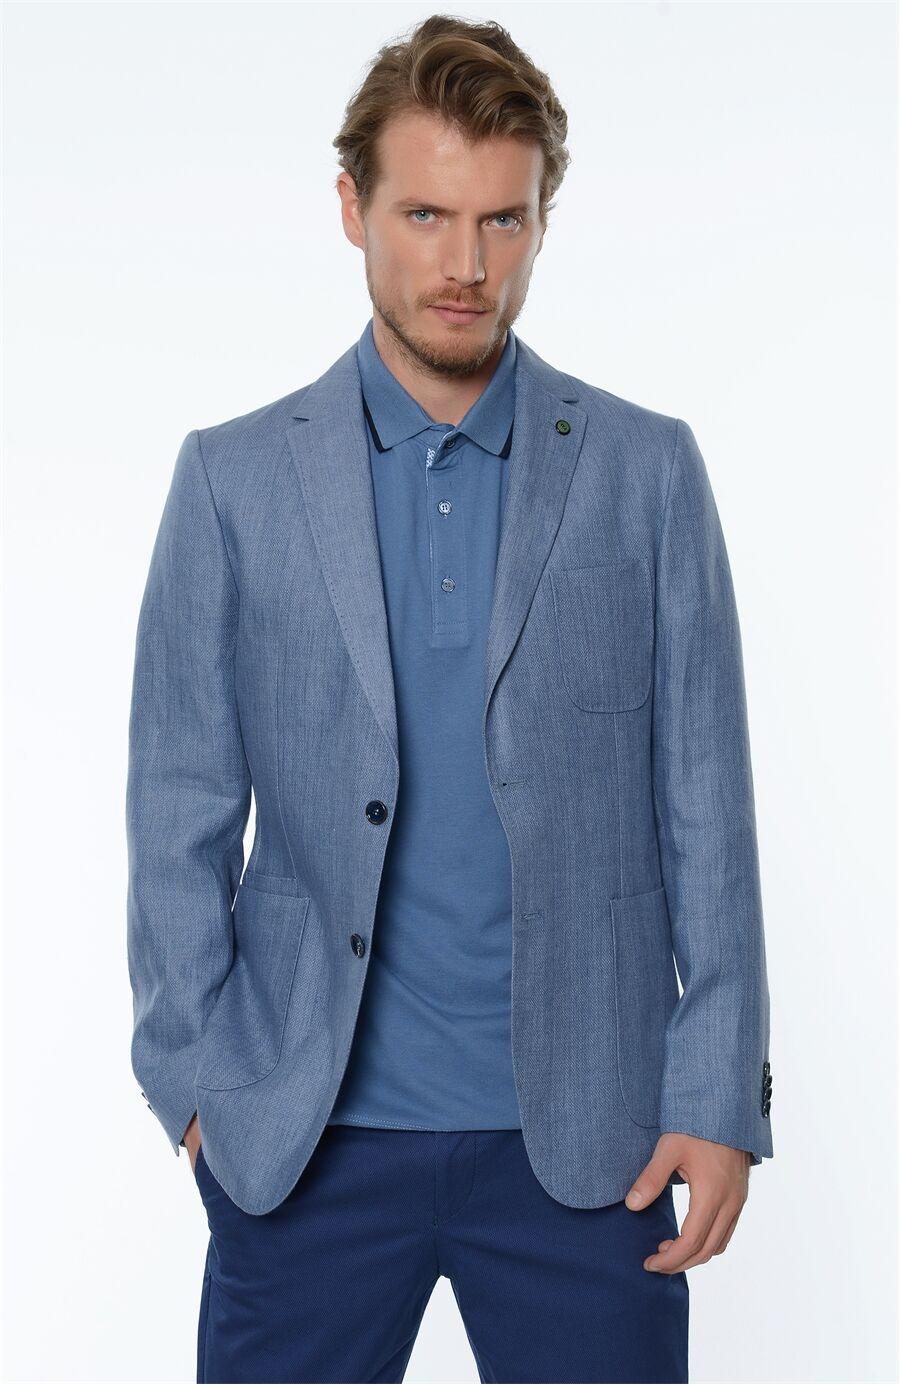 Mavi ceket 2019